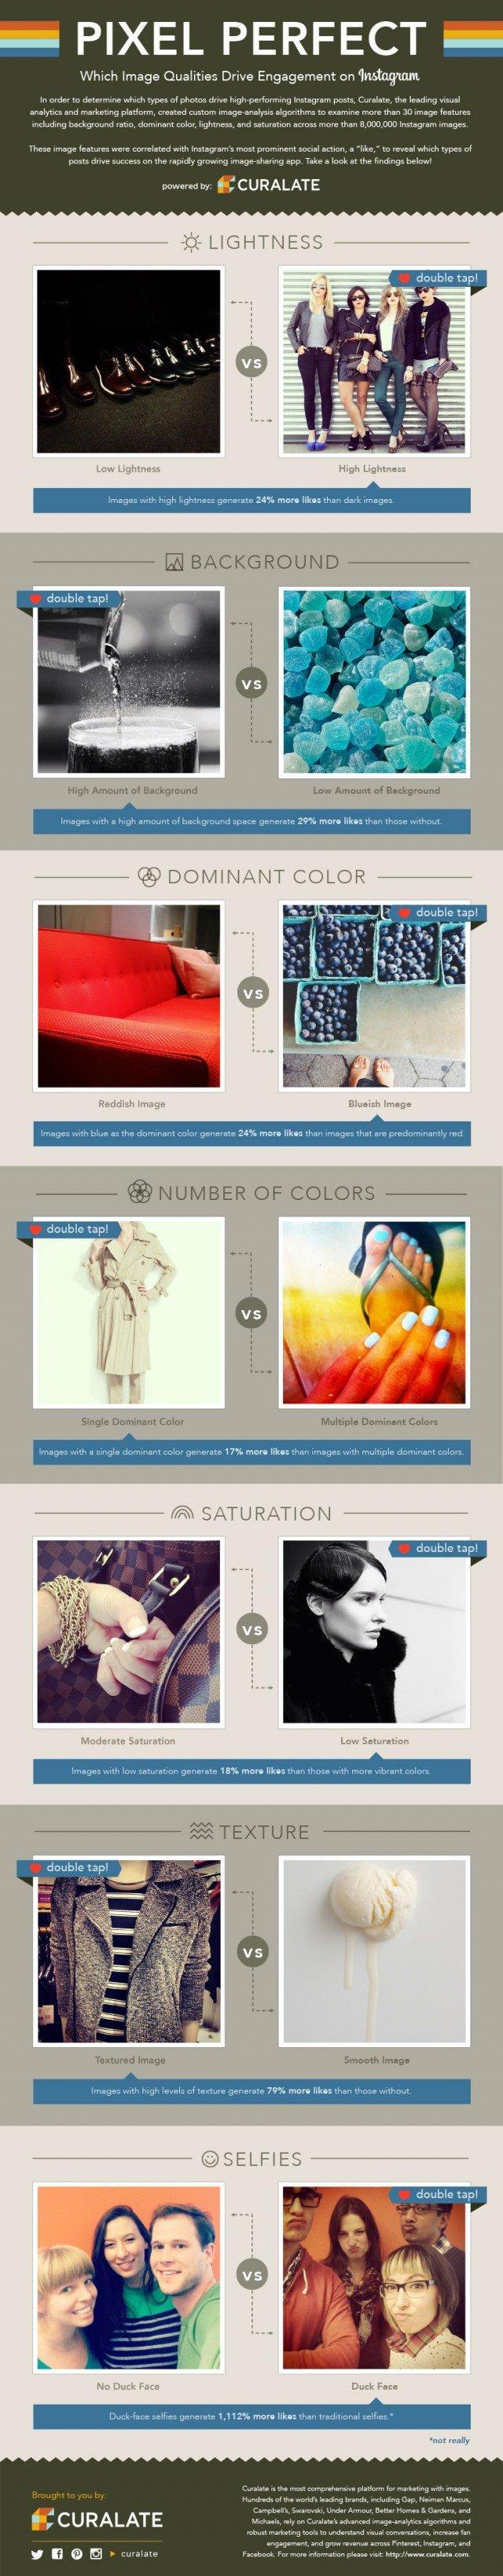 Instagram_Infographic_final-e1383880556712